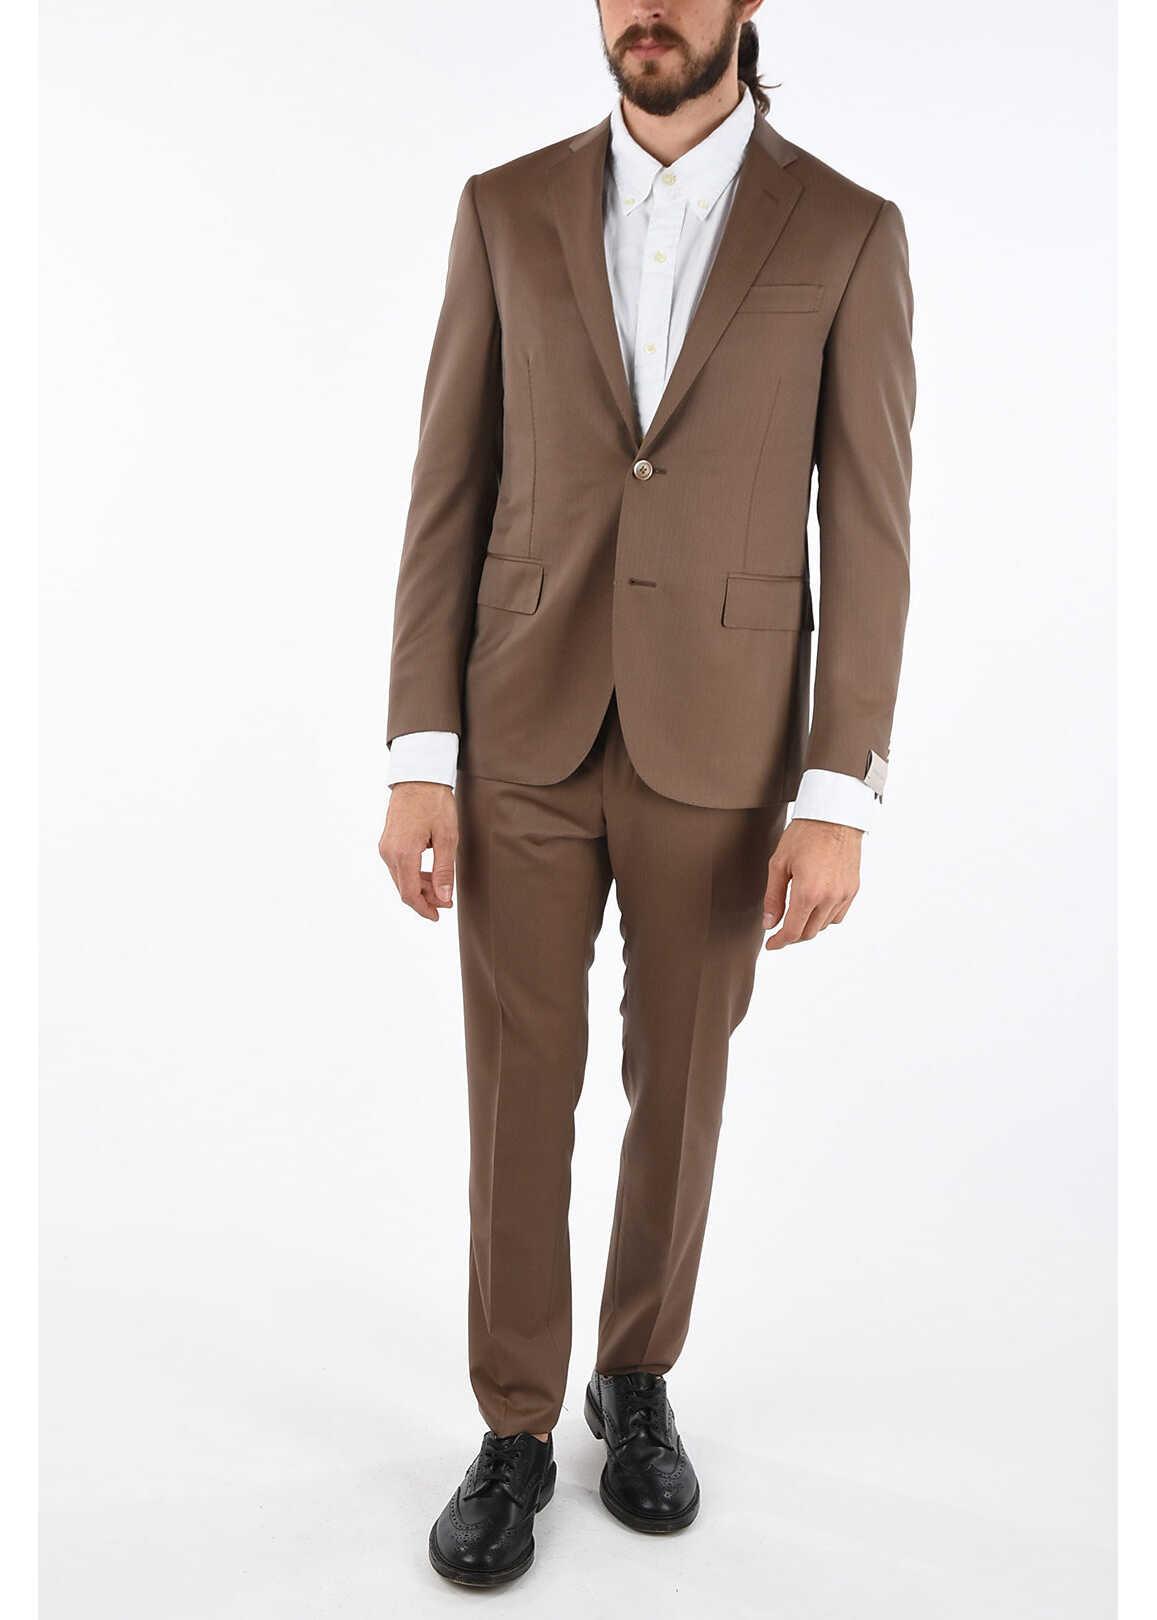 CORNELIANI hairline striped fresco ACADEMY SOFT 2-button suit BROWN imagine